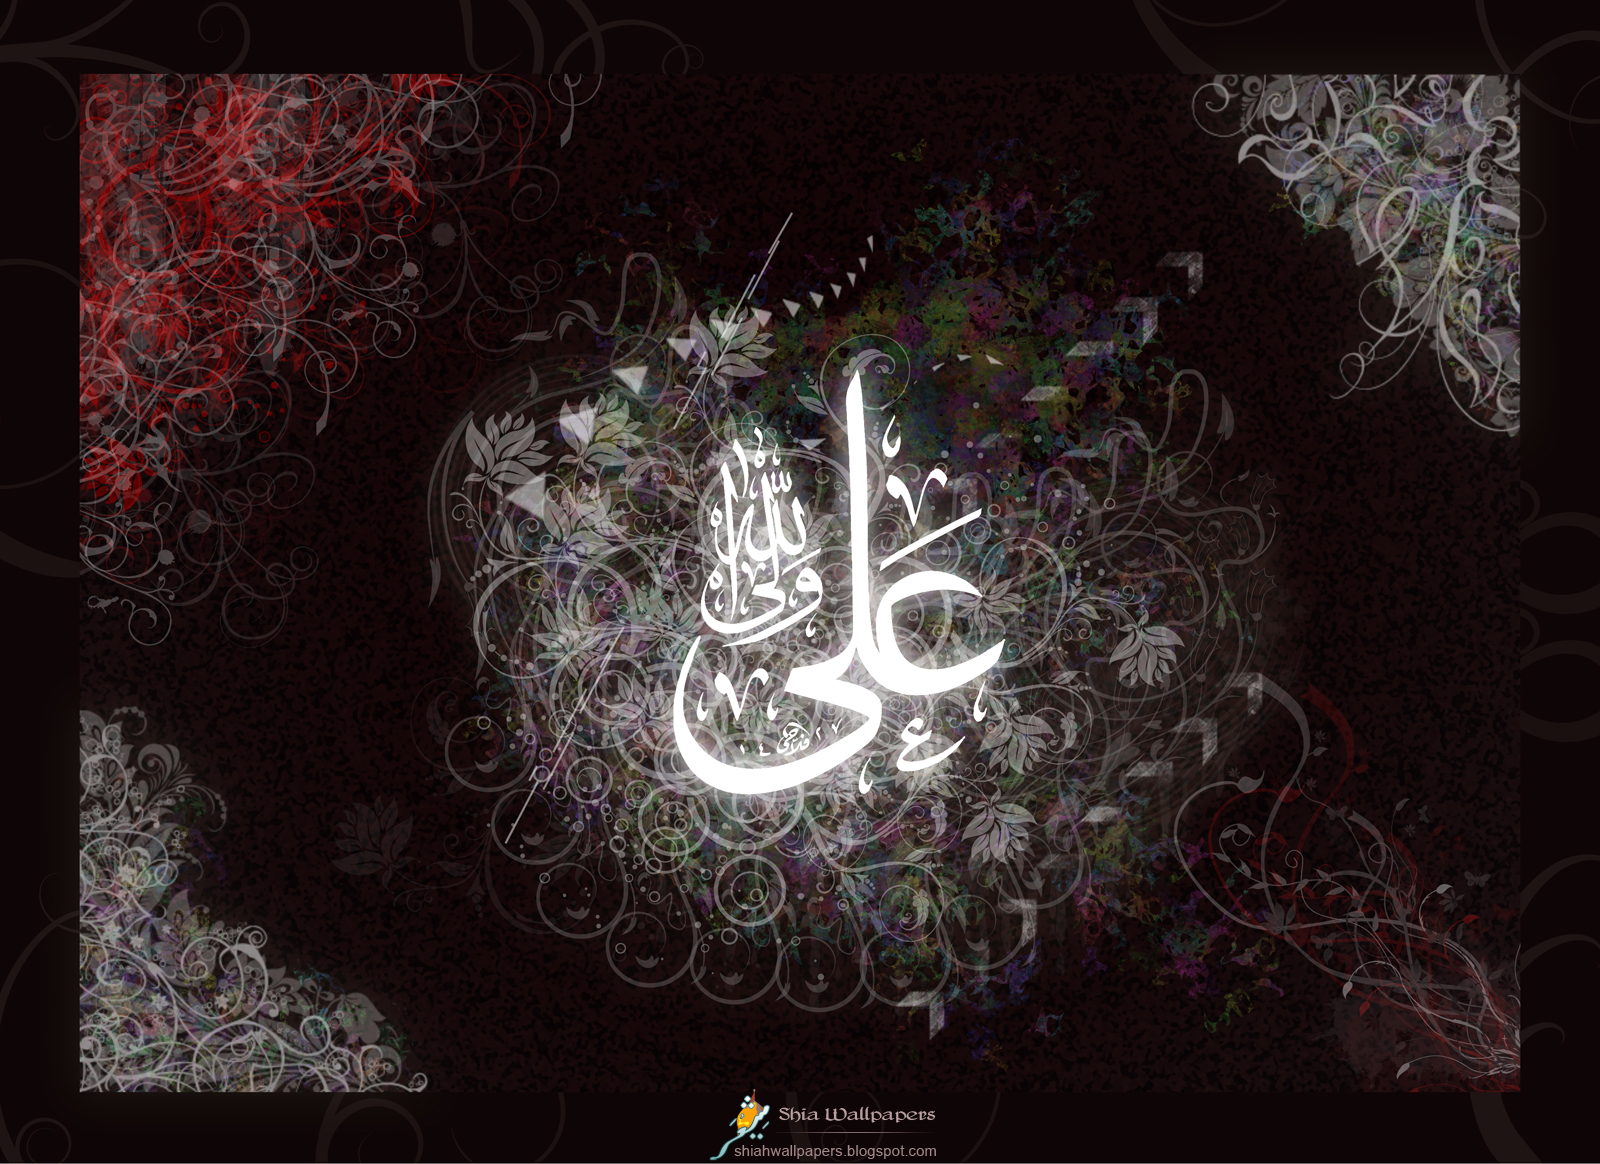 Wiladat Mola Ali Wallpapers | www.imgkid.com - The Image ...  Wiladat